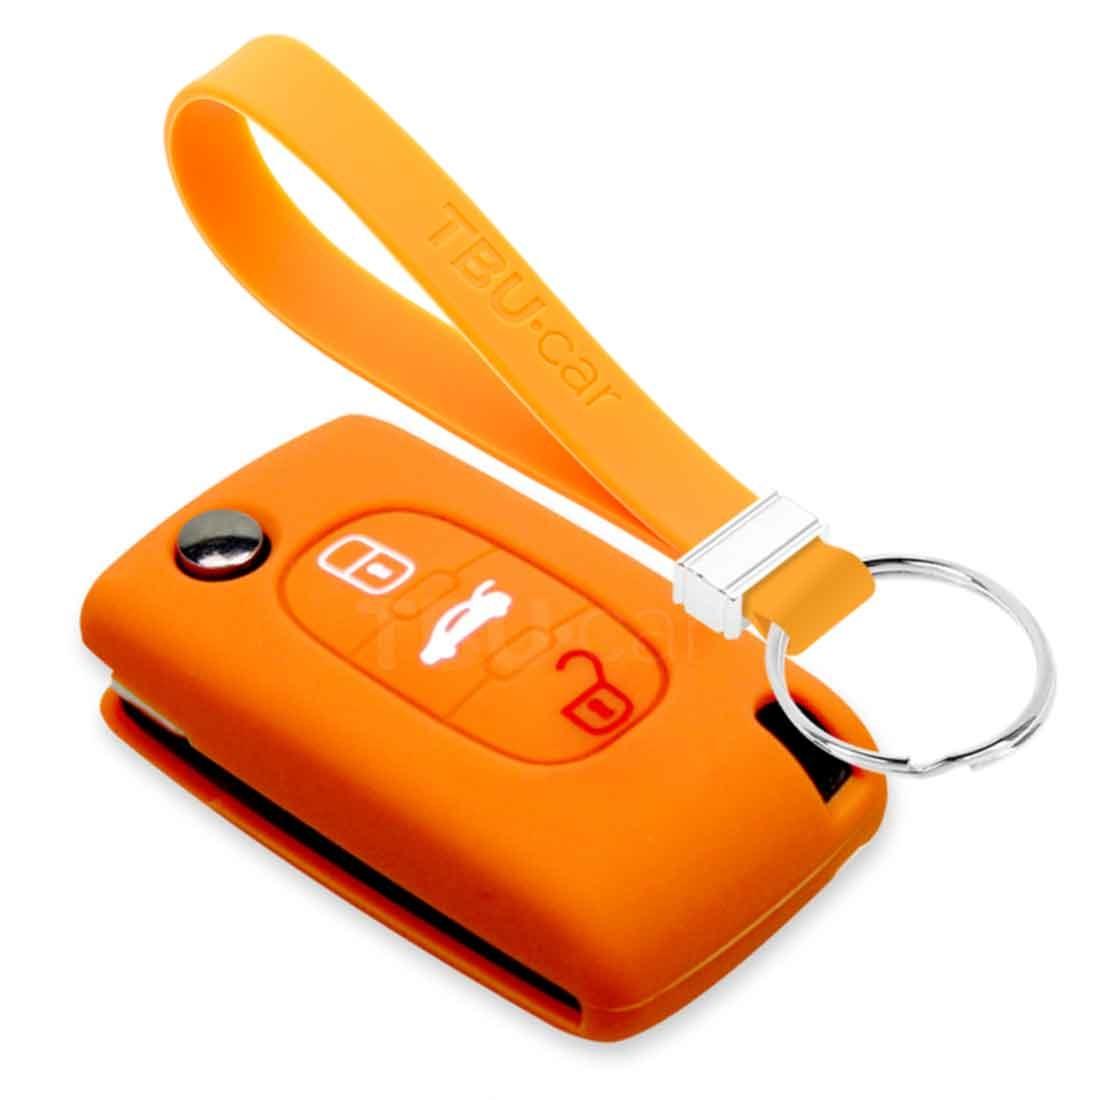 TBU car TBU car Funda Carcasa llave compatible con Fiat - Funda de Silicona - Cover de Llave Coche - Naranja